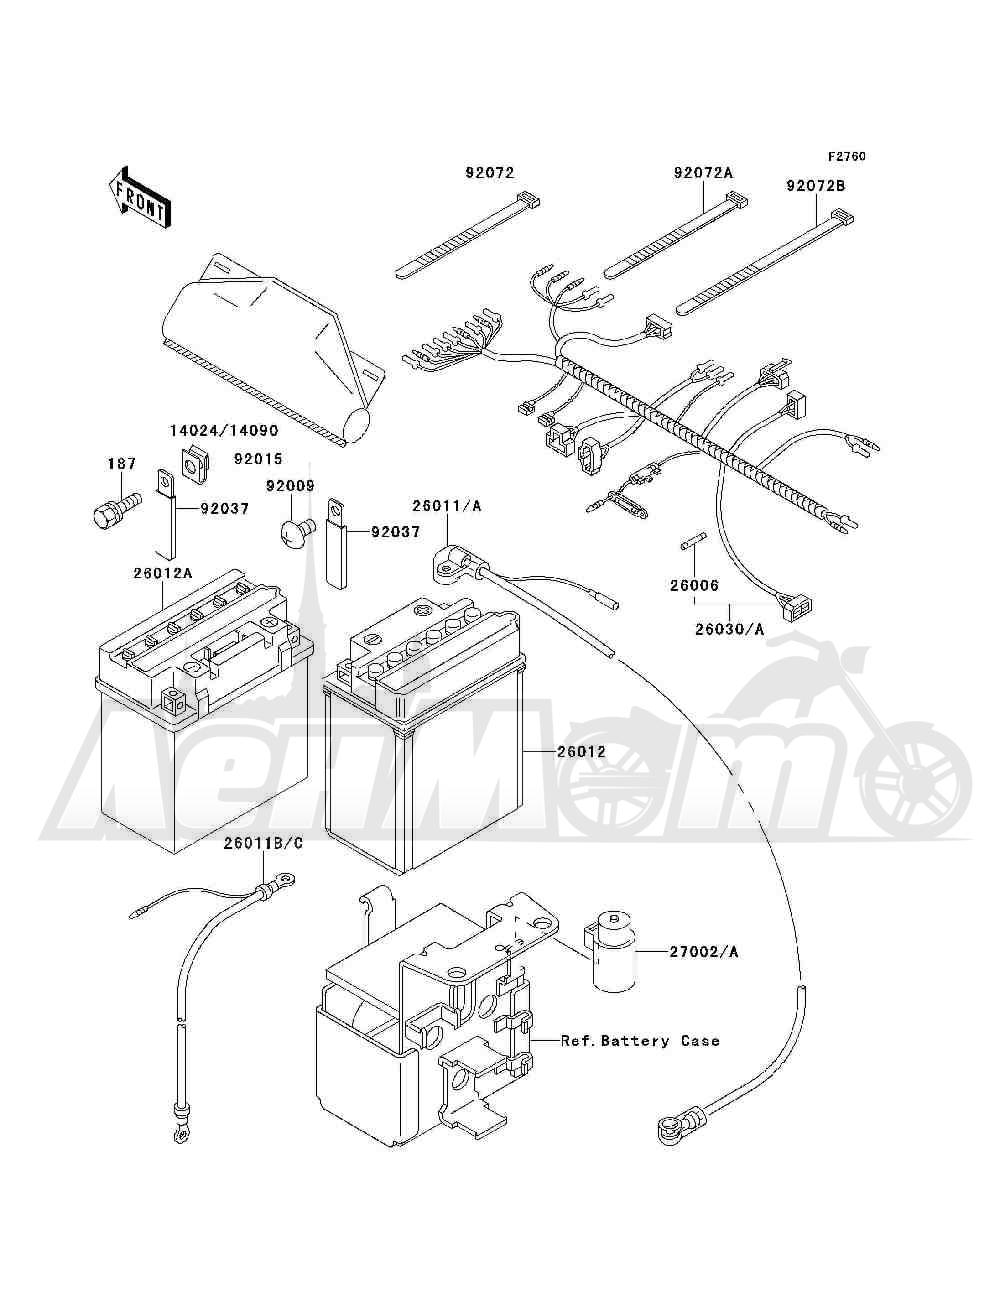 Запчасти для Квадроцикла Kawasaki 1994 BAYOU 300 4X4 (KLF300-C6) Раздел: CHASSIS ELECTRICAL EQUIPMENT | шасси электрическое оборудование